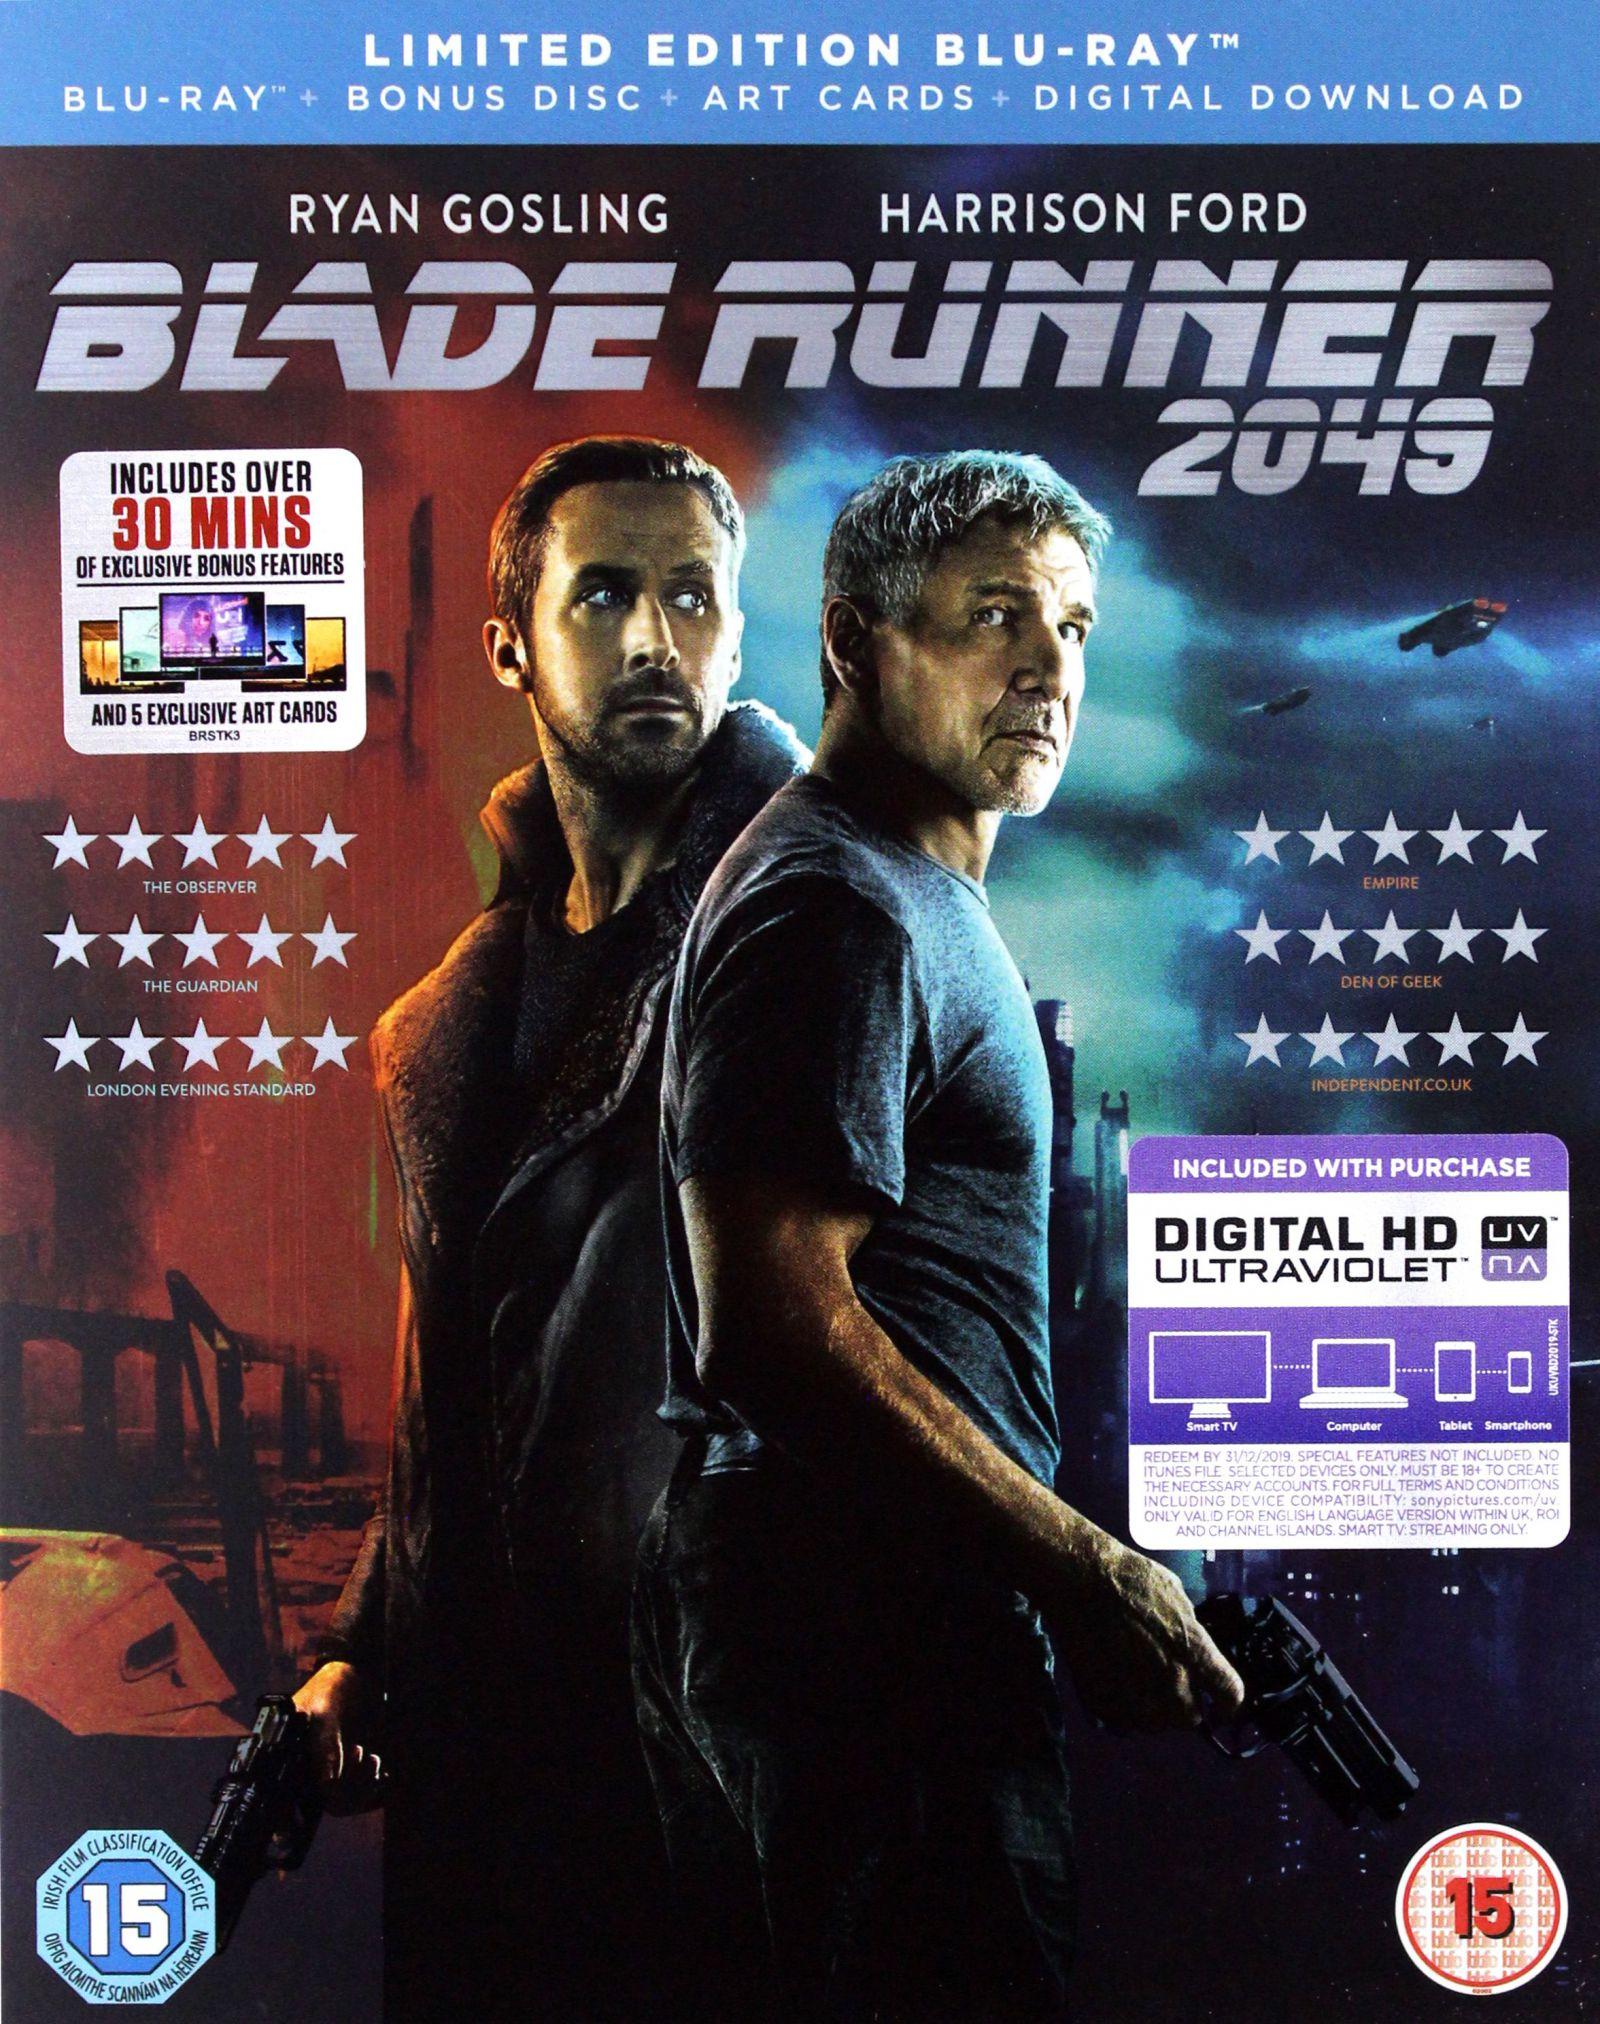 BLADE RUNNER 2049 (LIMITED EDITION) 2XBLU-RAY+KART